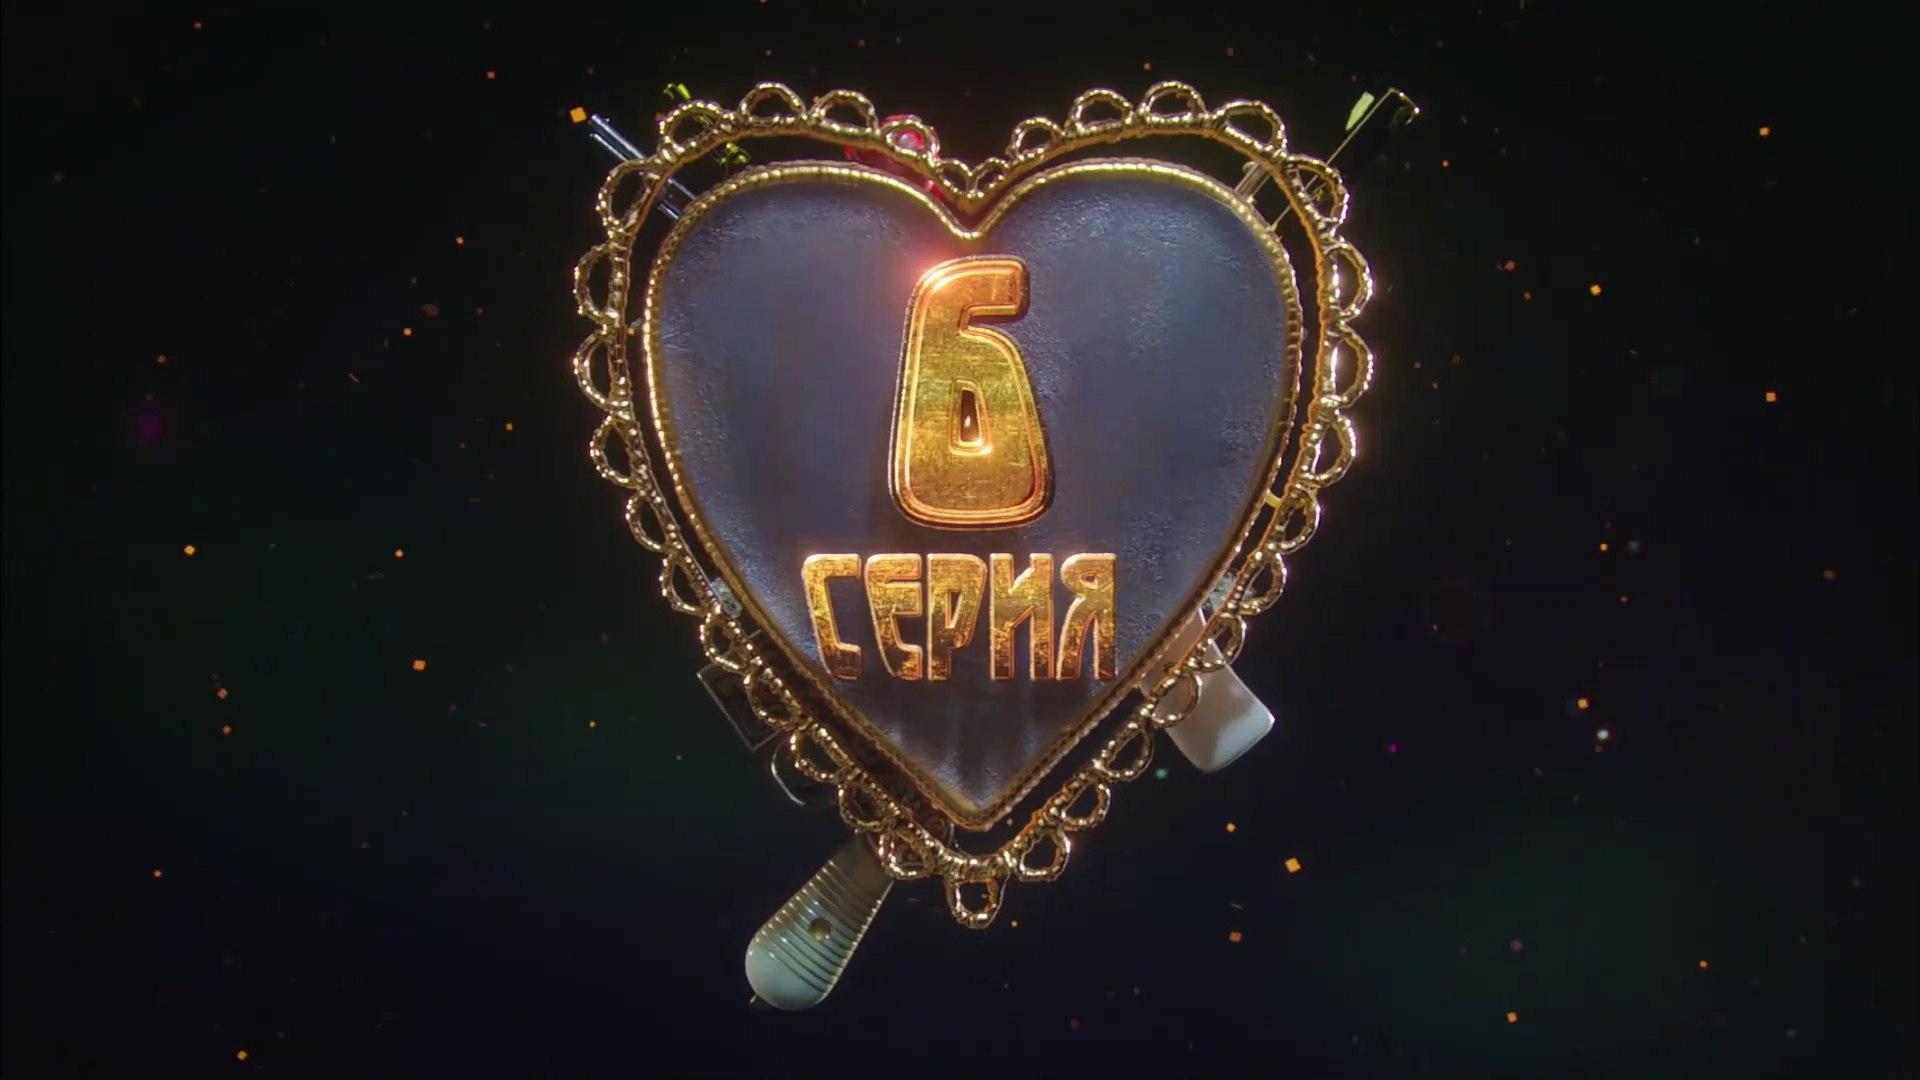 Мурка - 6 серия (2016) HD смотреть онлайн